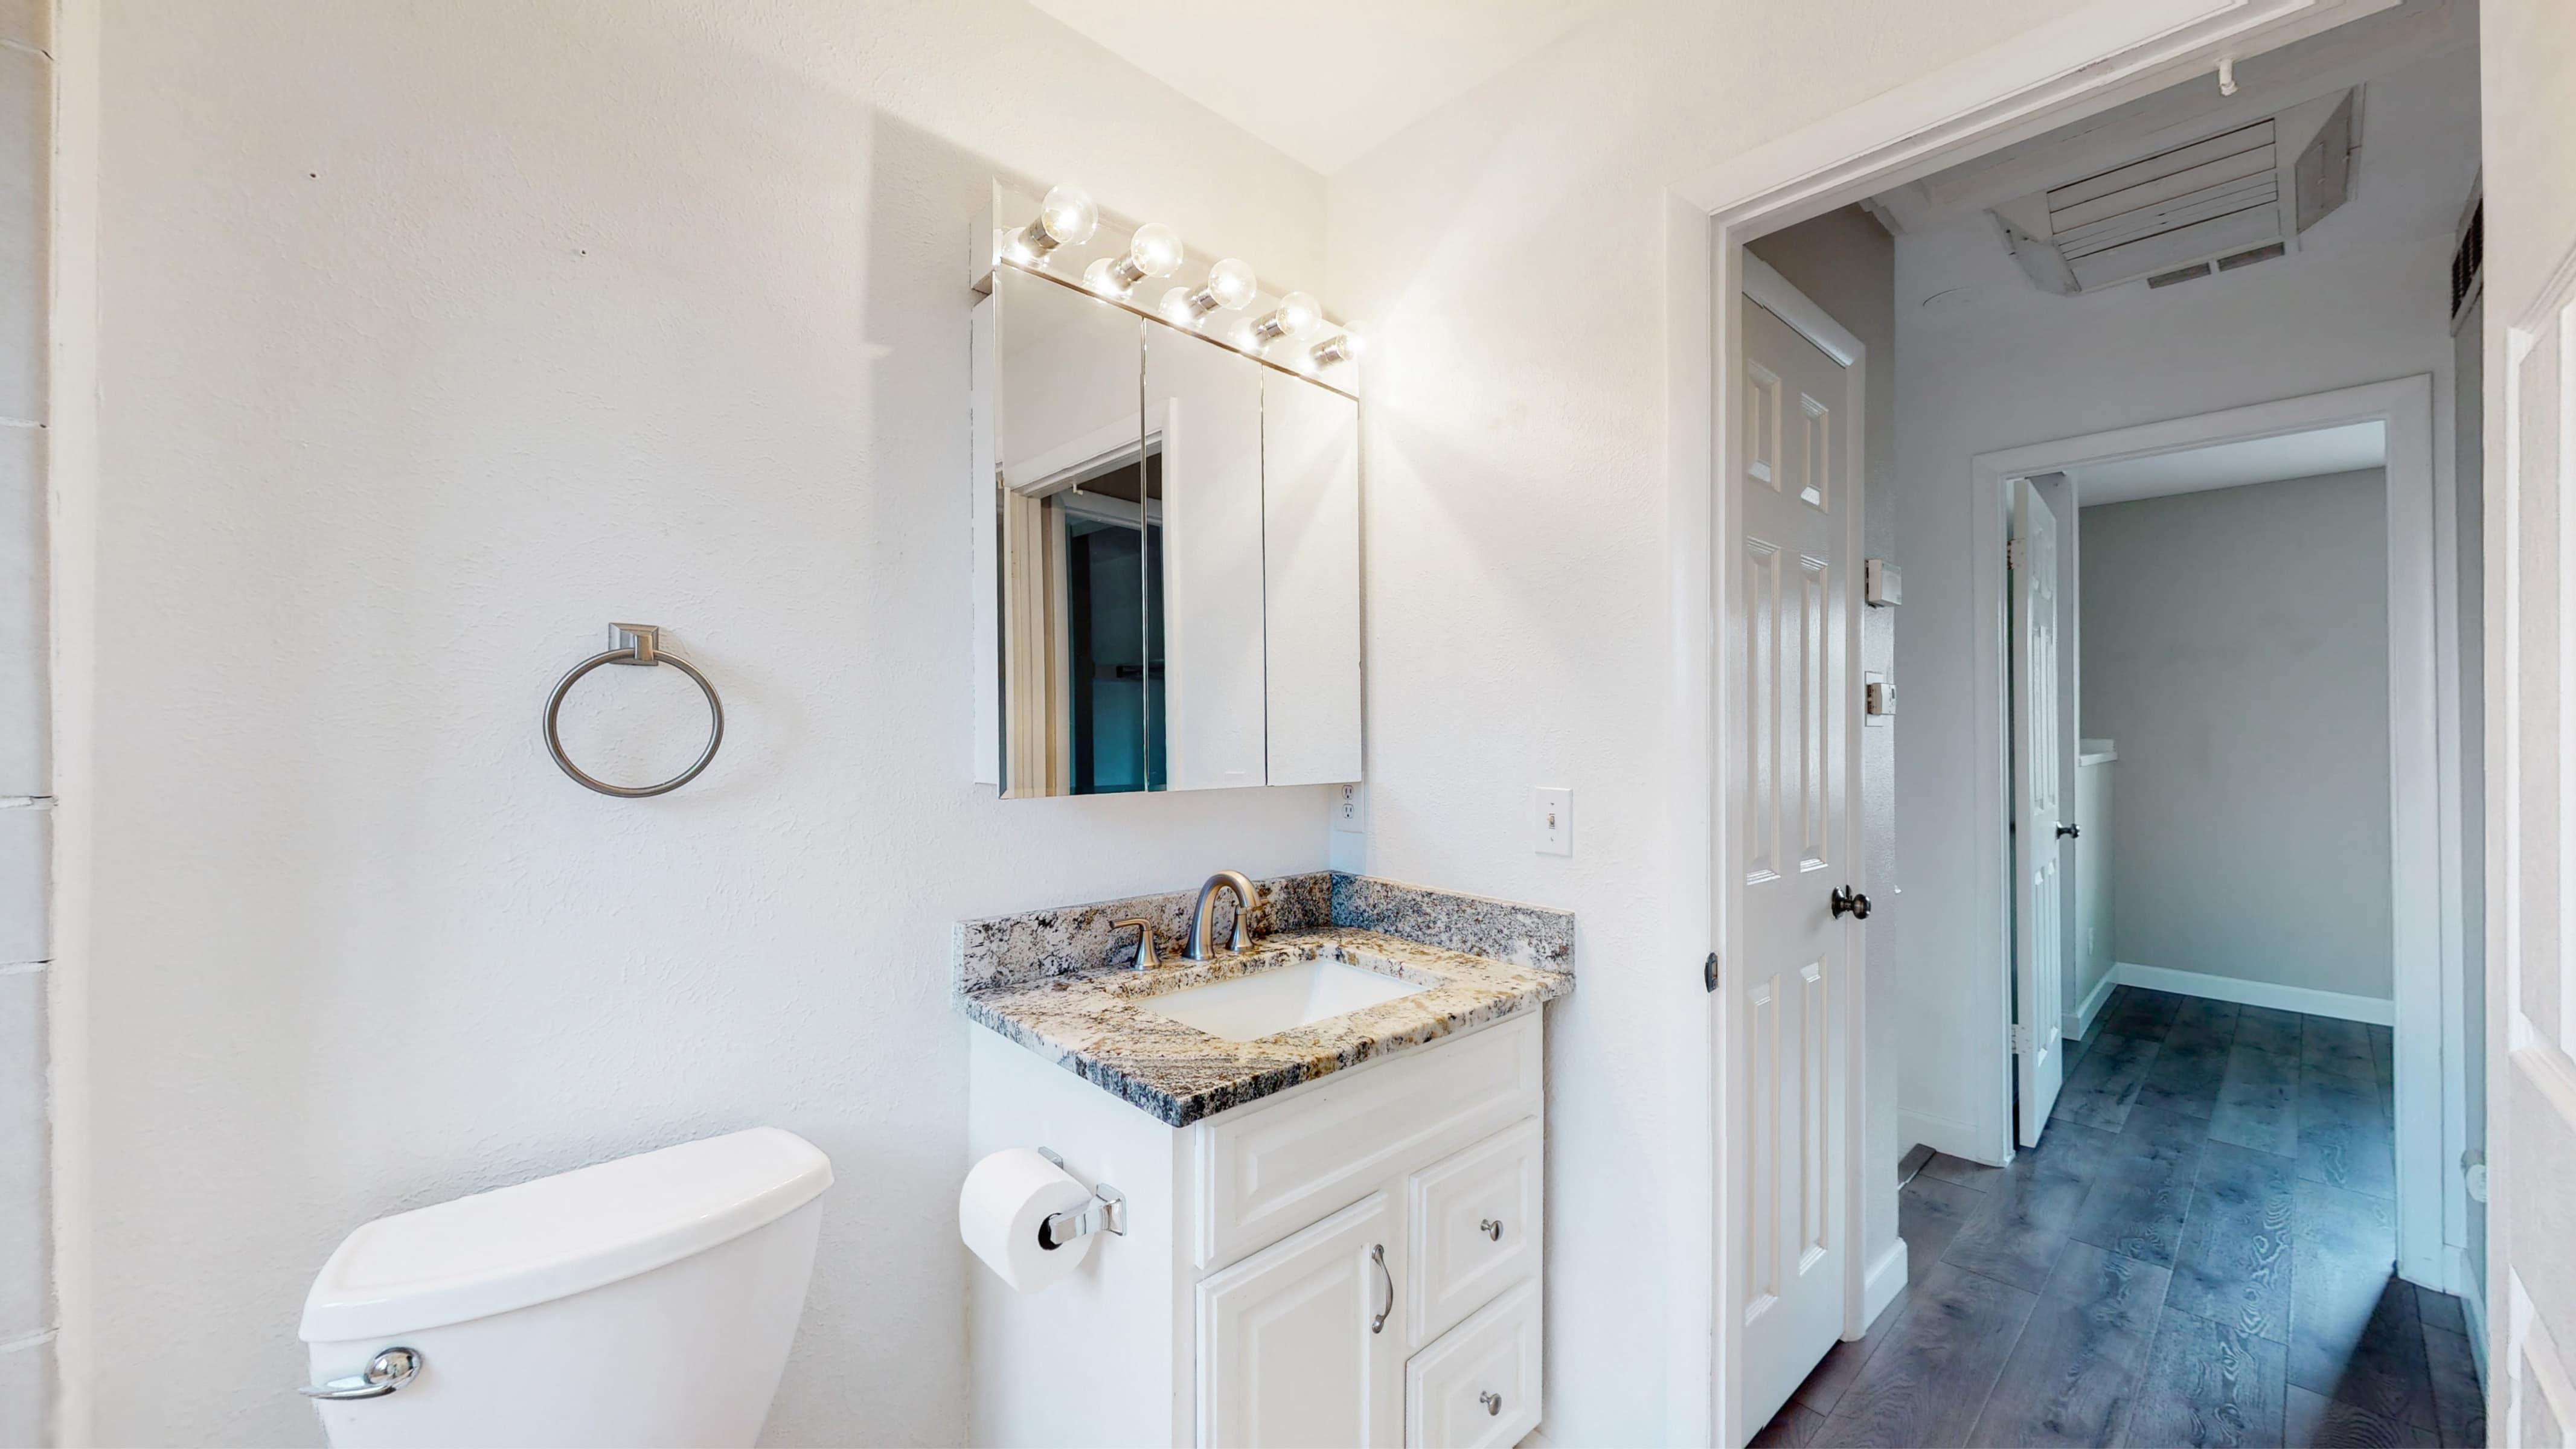 Upstairs bathroom, white, with white vanity, granite top vanity